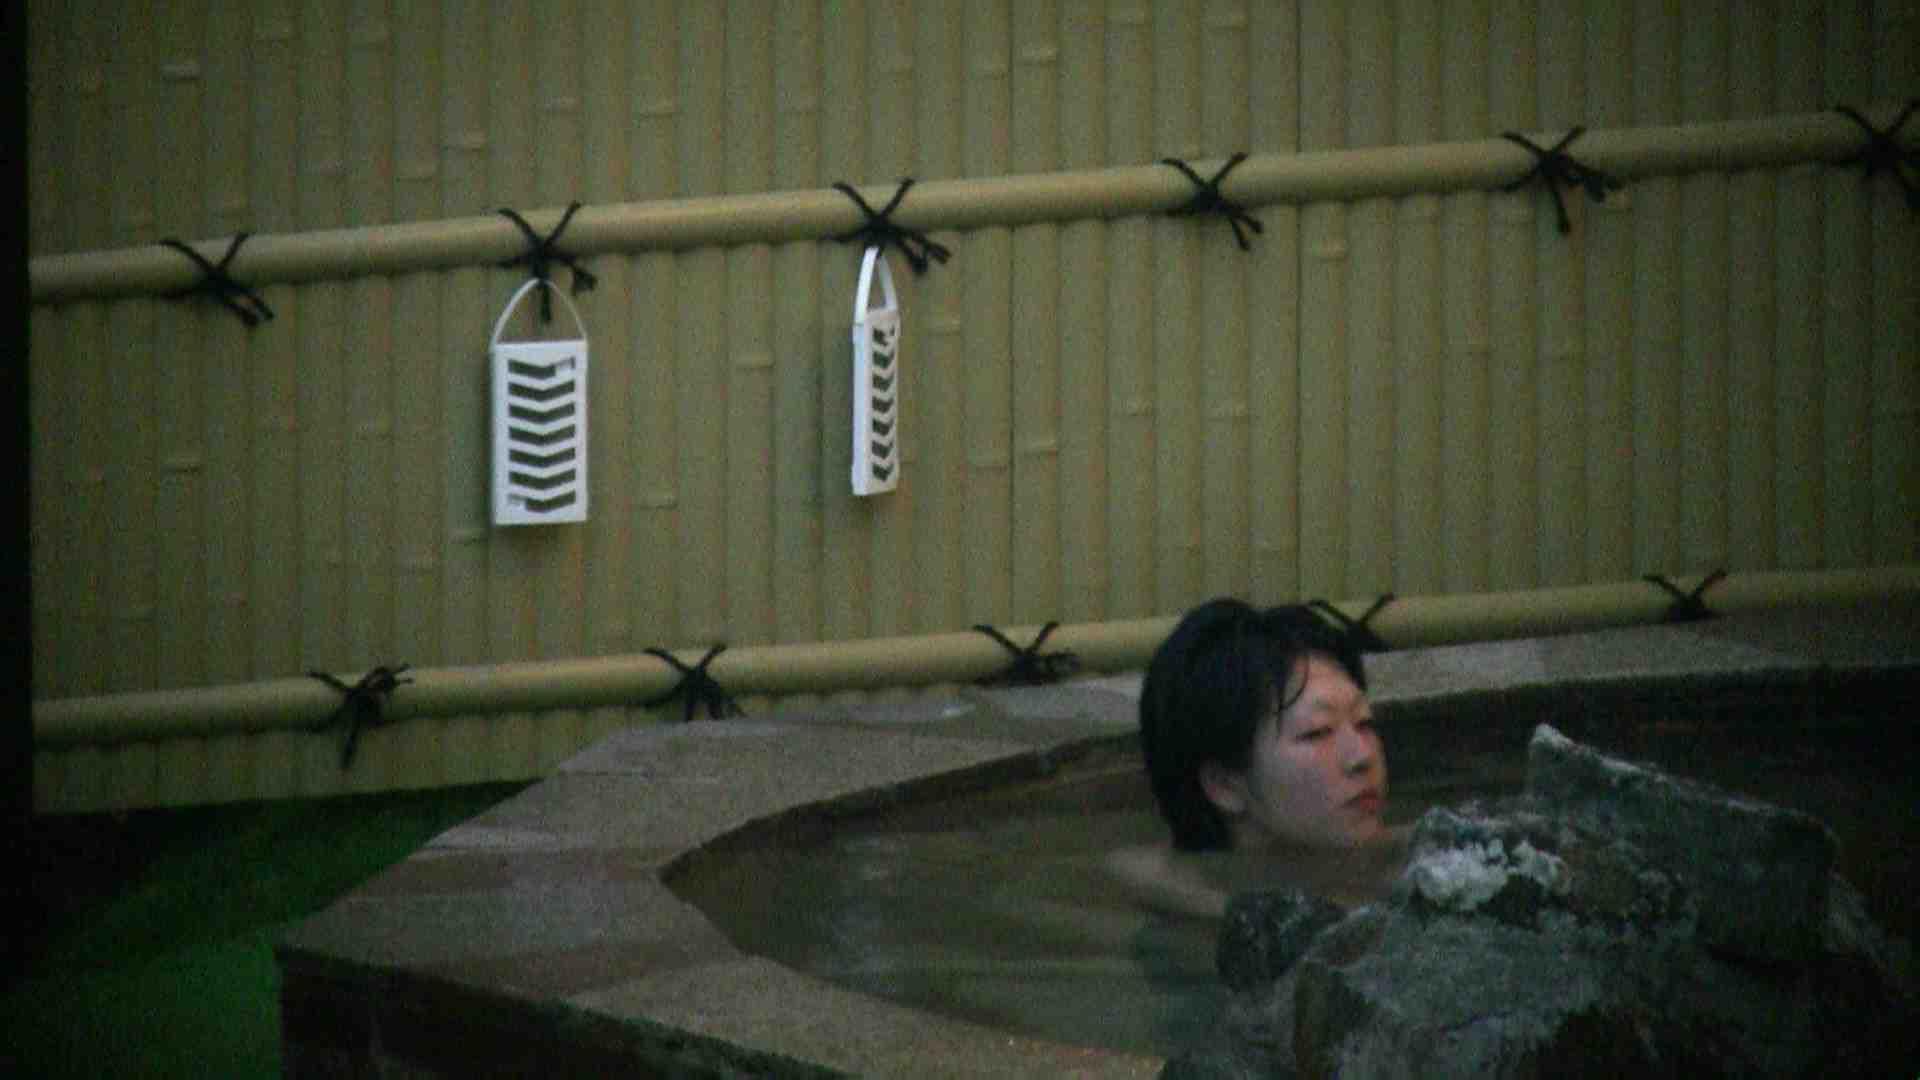 Aquaな露天風呂Vol.05【VIP】 露天風呂編 | 盗撮シリーズ  112PIX 61